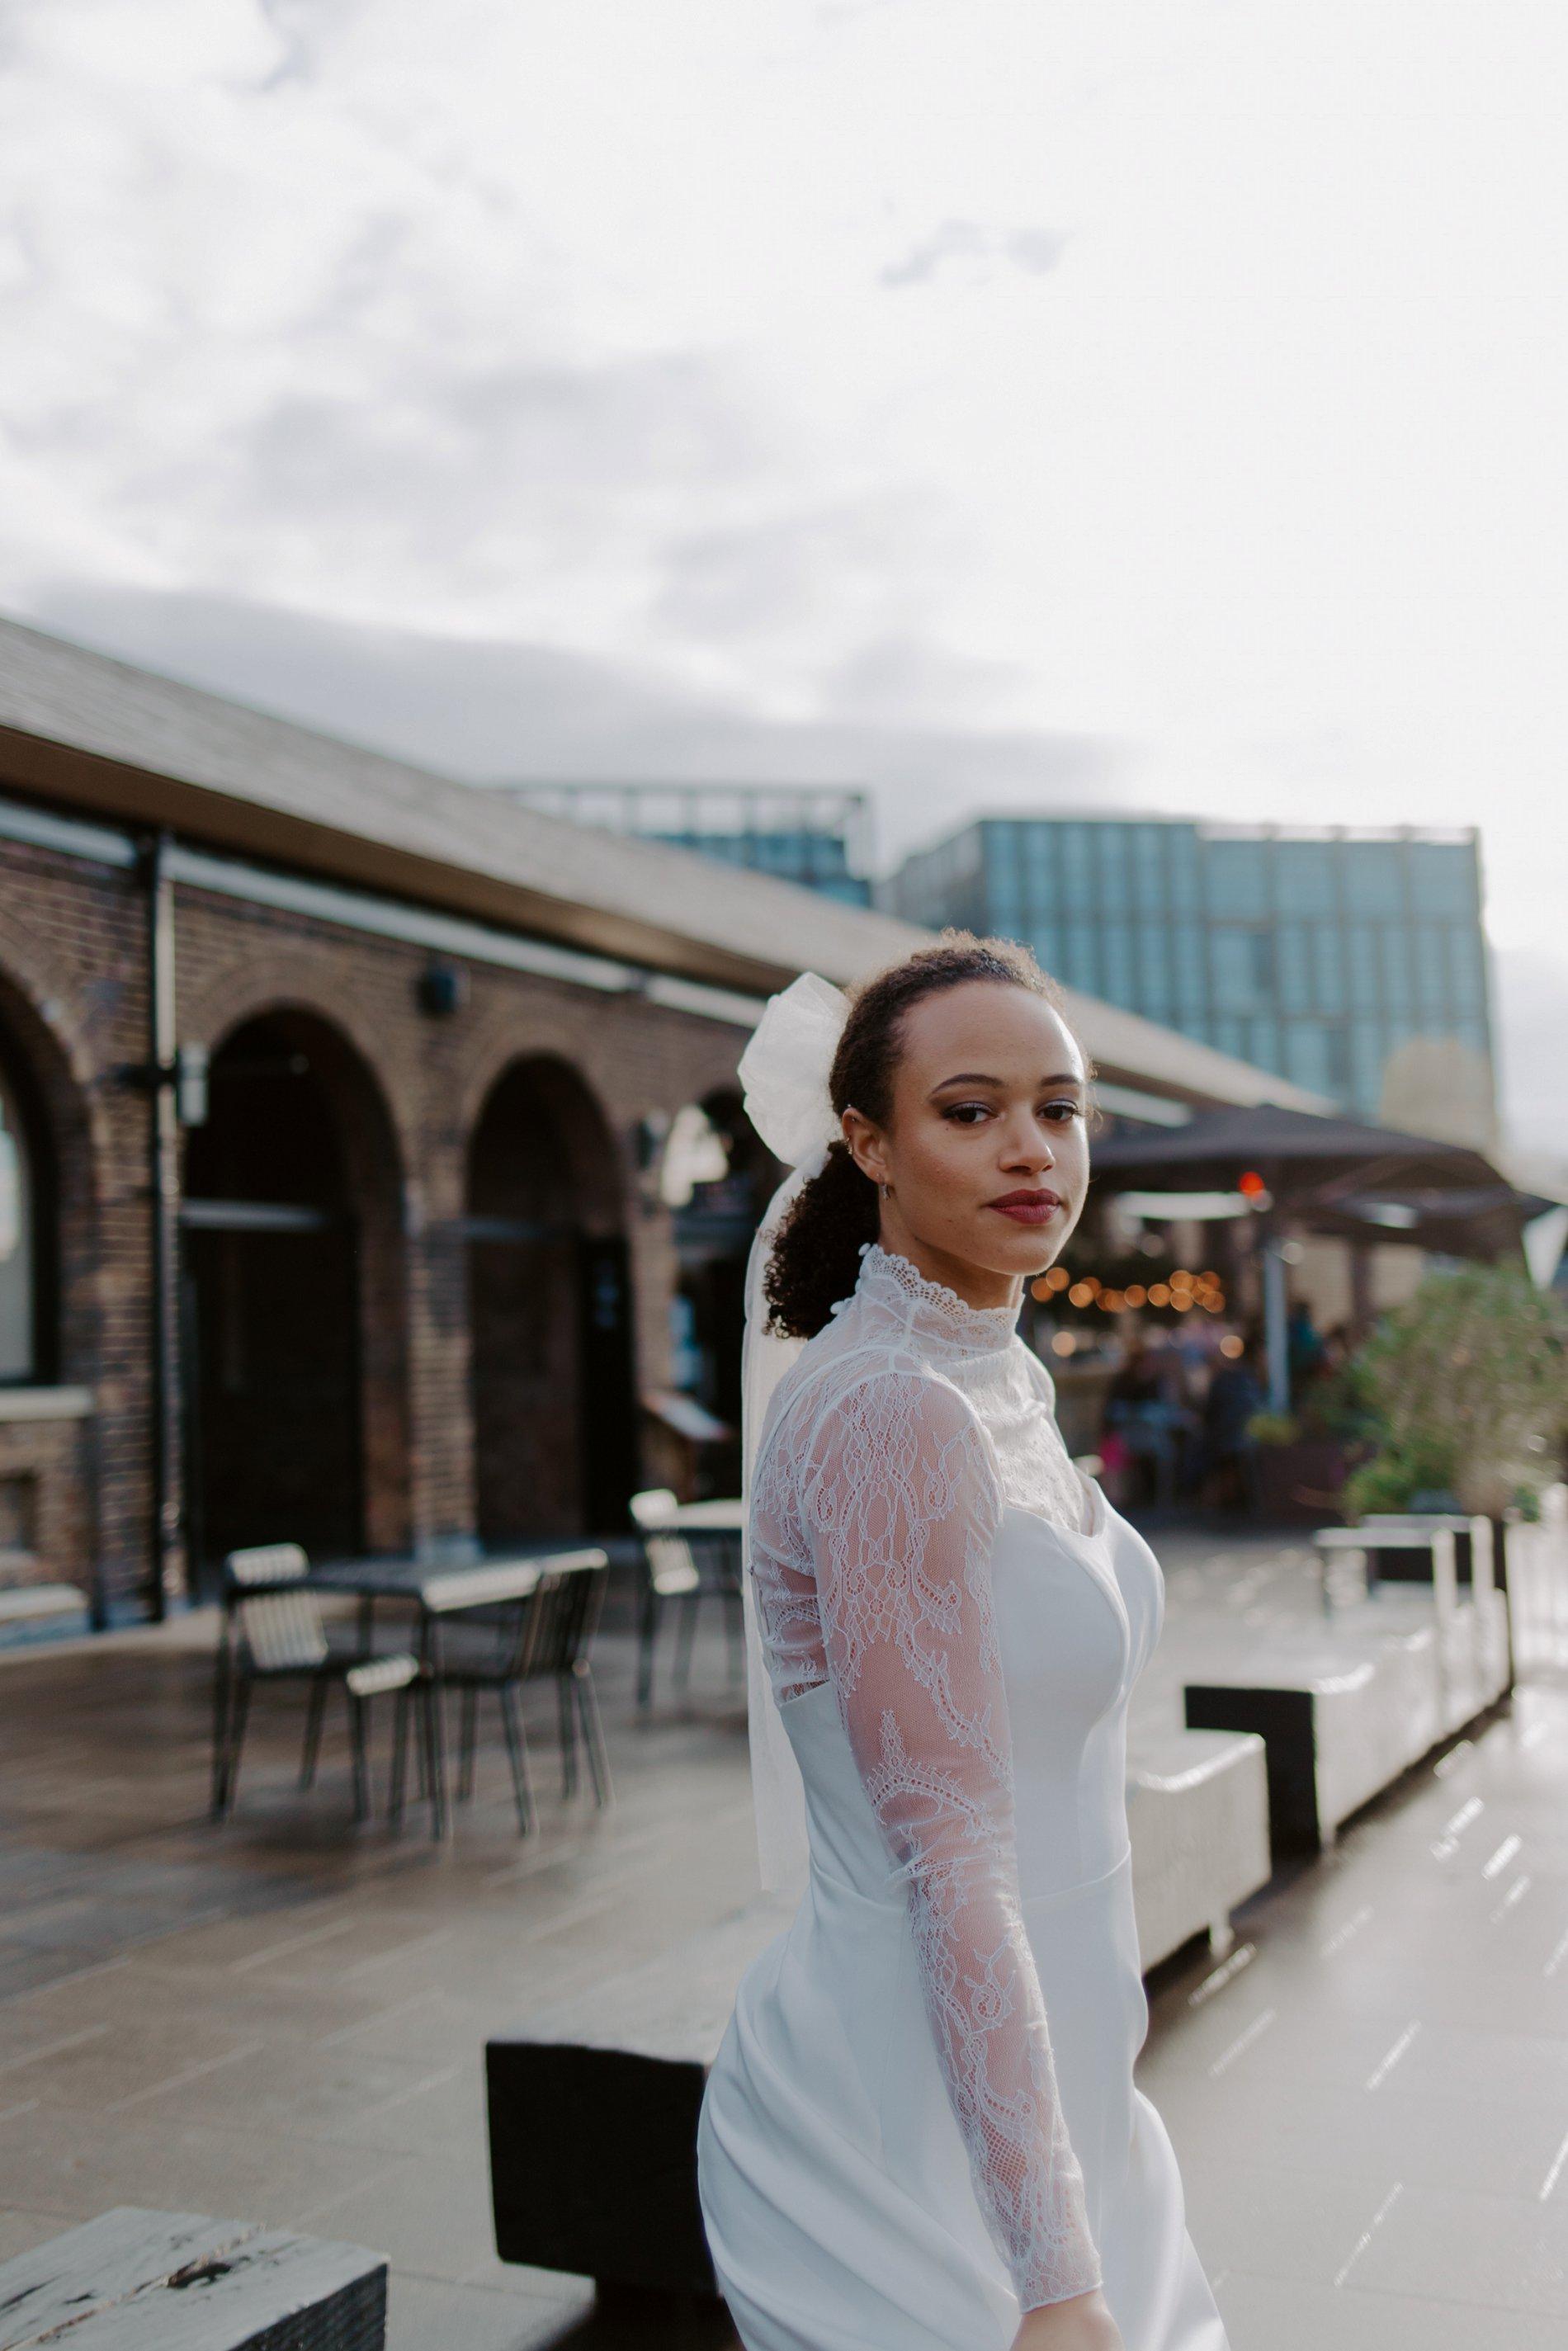 City Wedding Styled Shoot at Coal Drops Yard (c) Emztography (30)